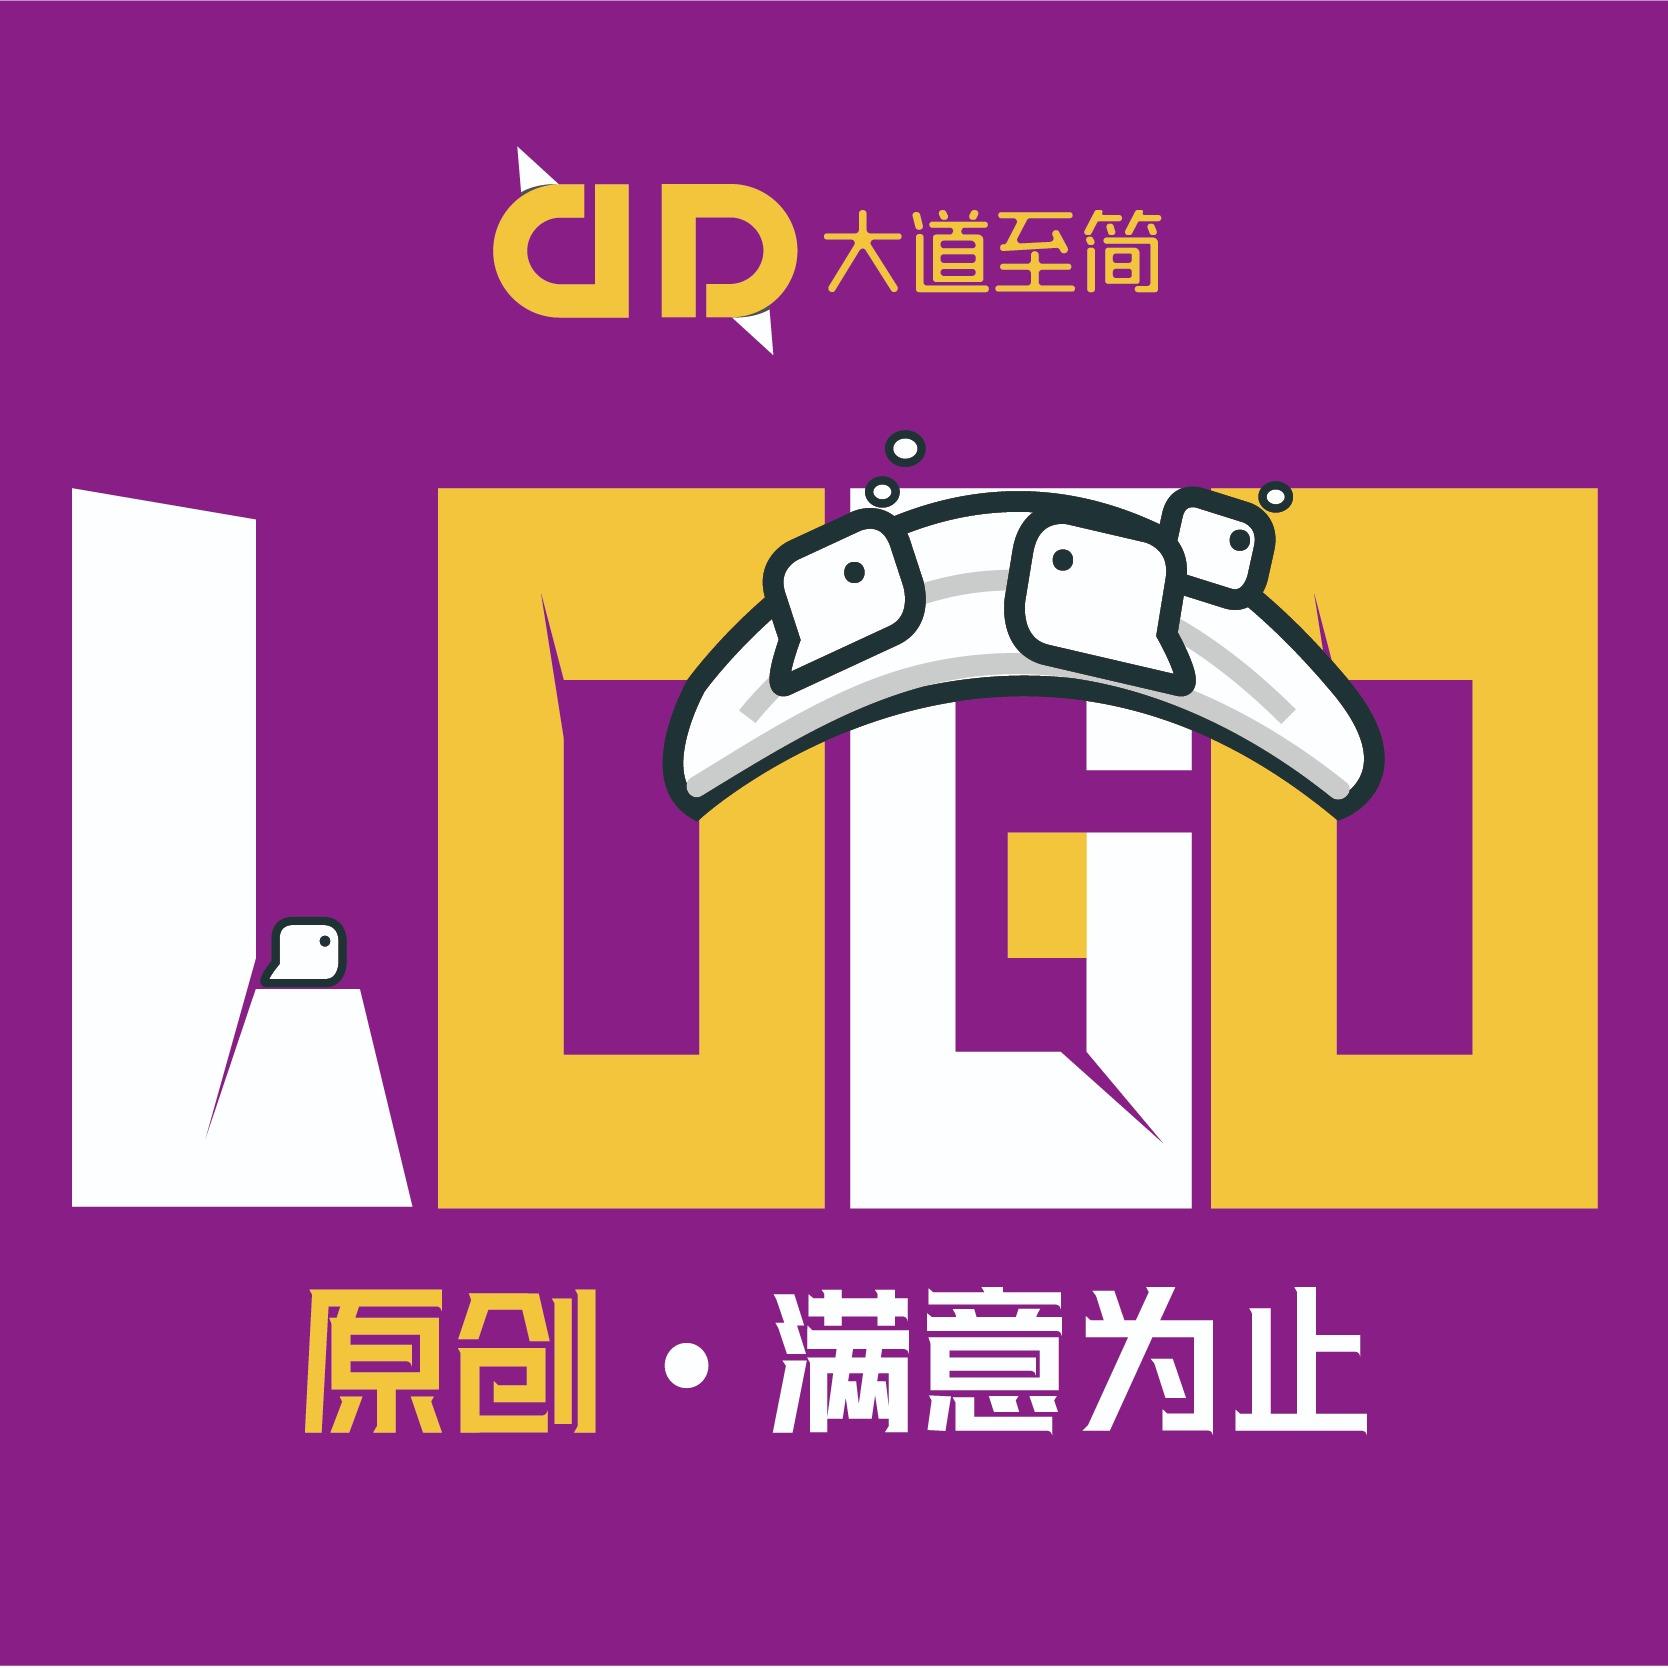 logo设计原创公司标志卡通平面插画企业品牌商标